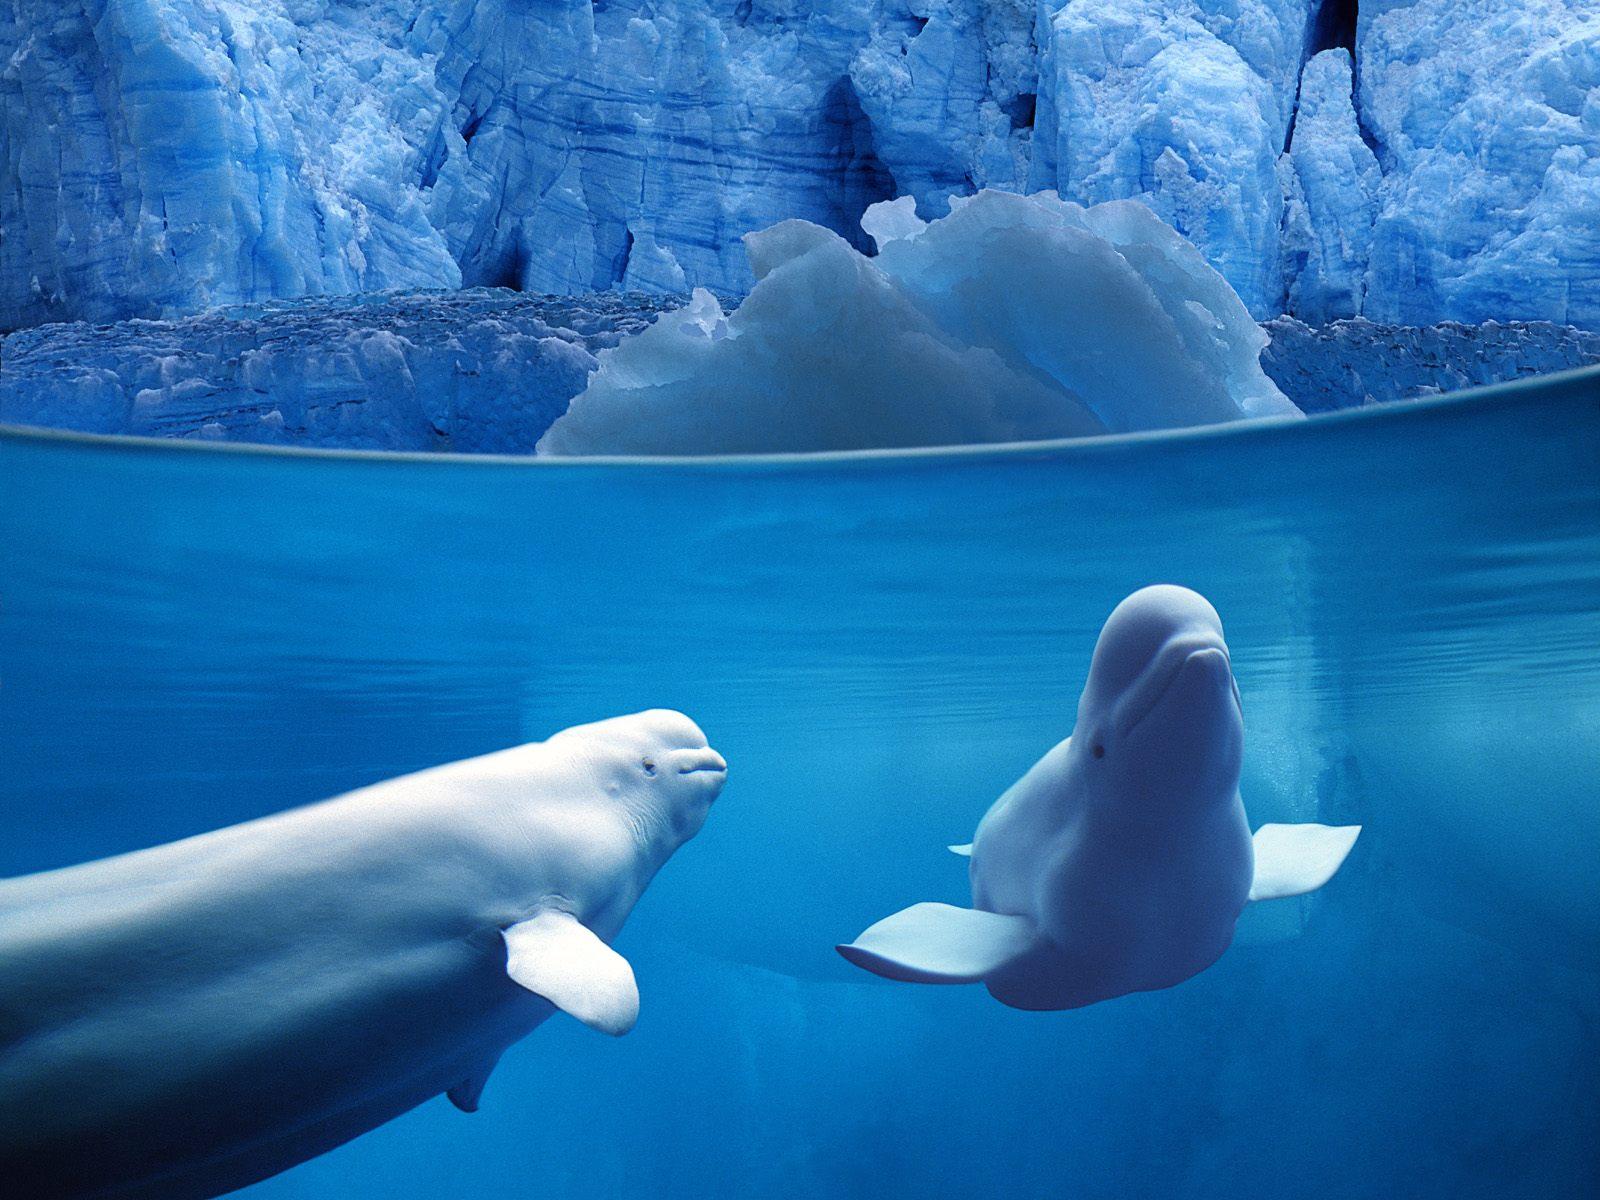 Beluga Whale Wallpapers hd